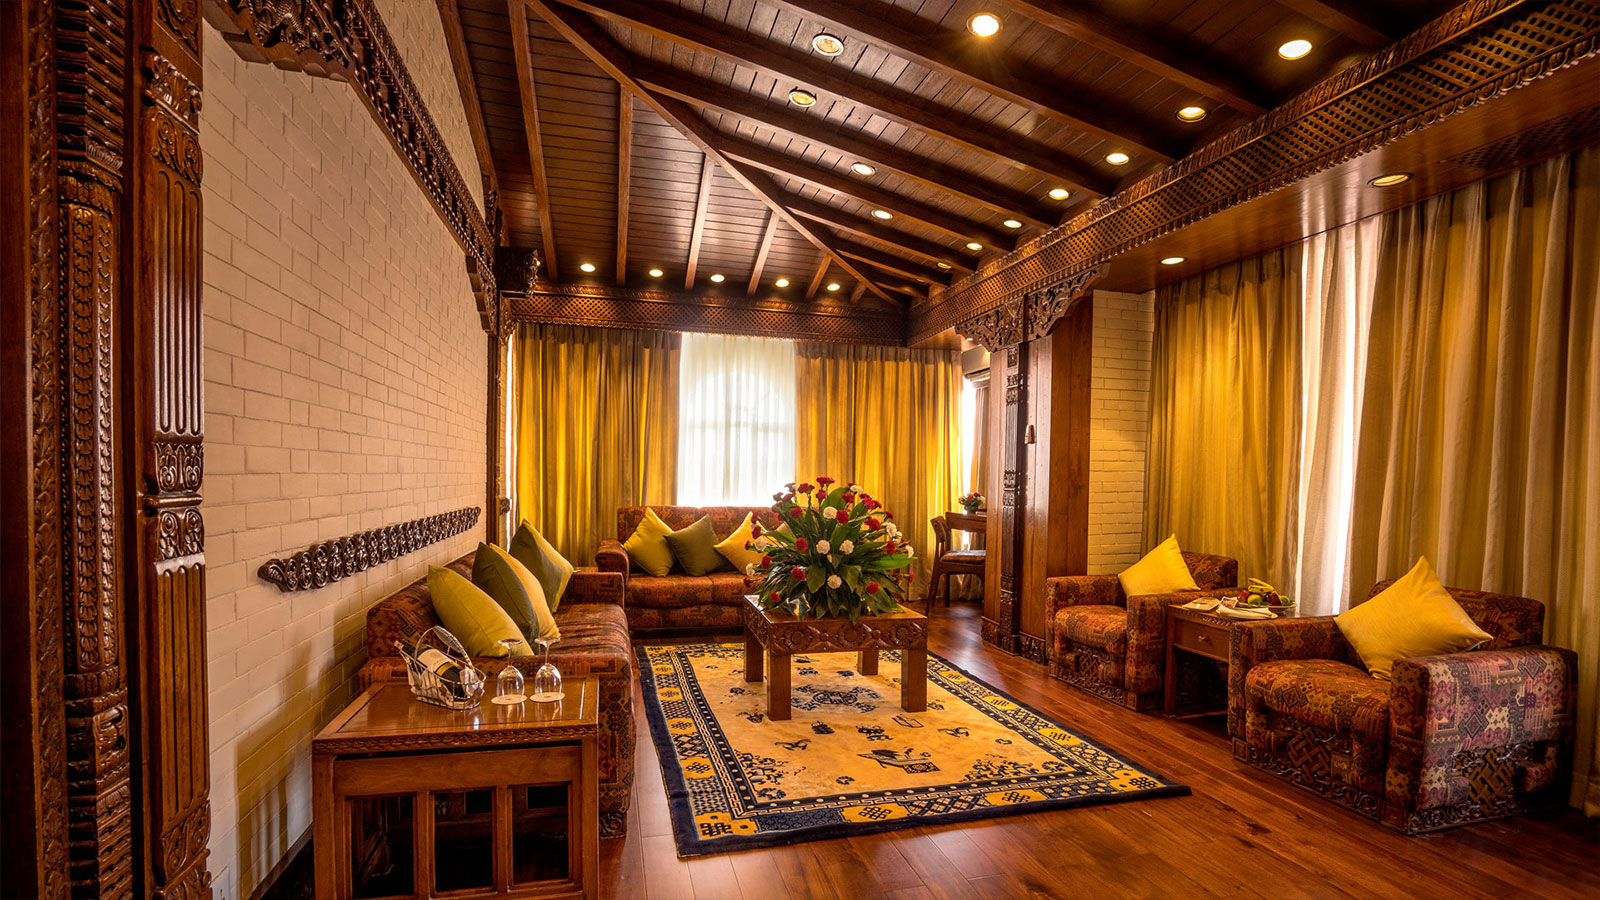 Hotel yak yeti luxury 5 star deluxe hotel in kathmandu for Interior house design in nepal